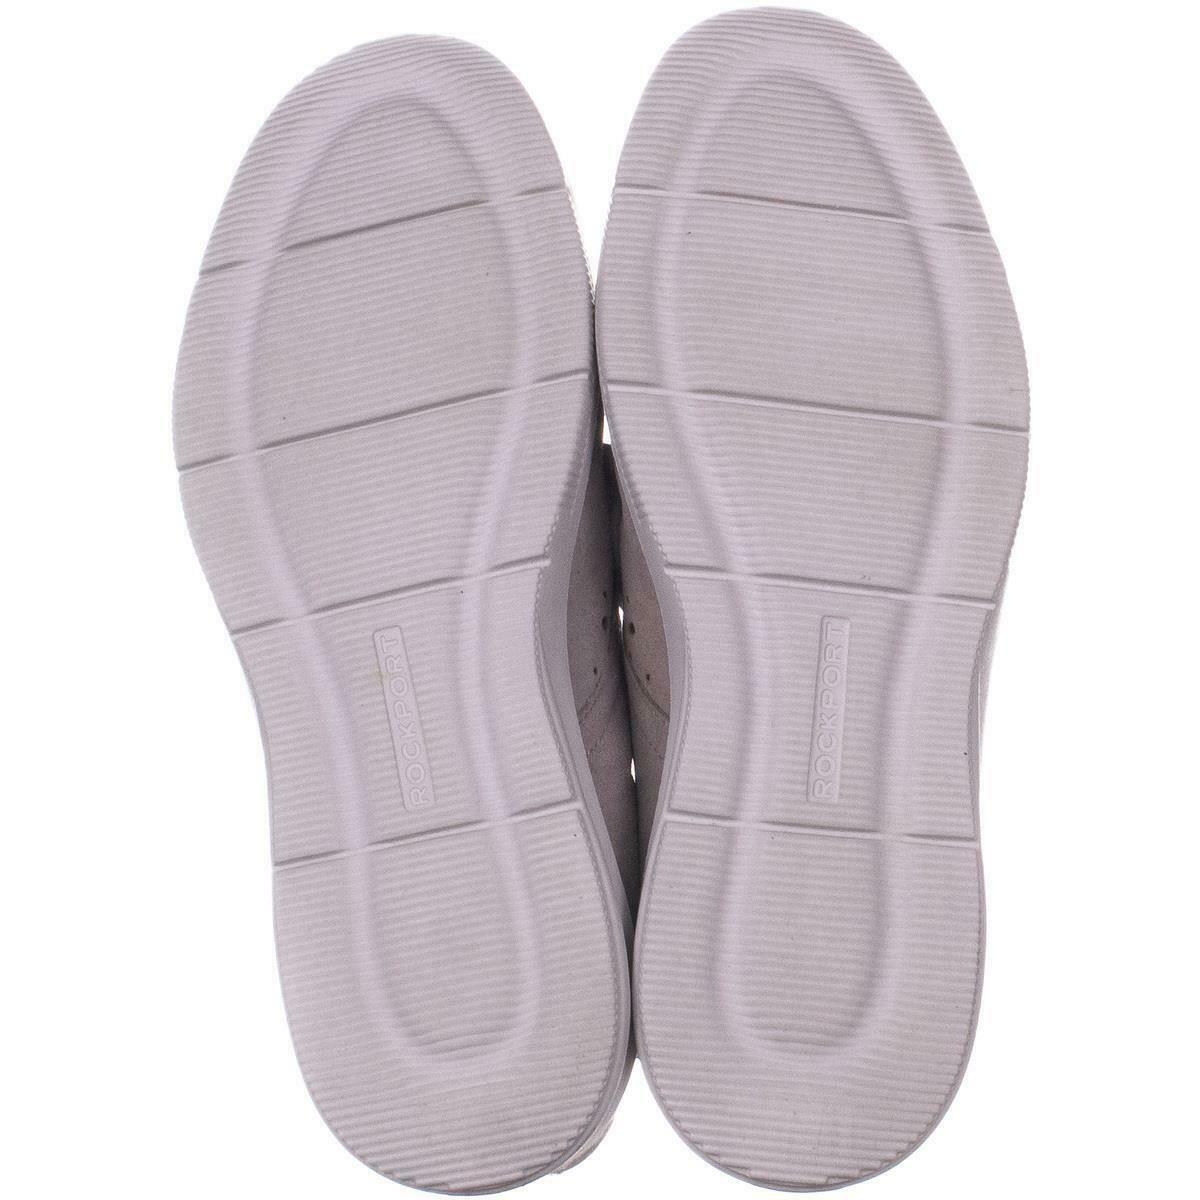 Rockport Ayva Schnürschuhe Oxford Sneakers 219, Hellgrau, 7 US 37.5 Eu